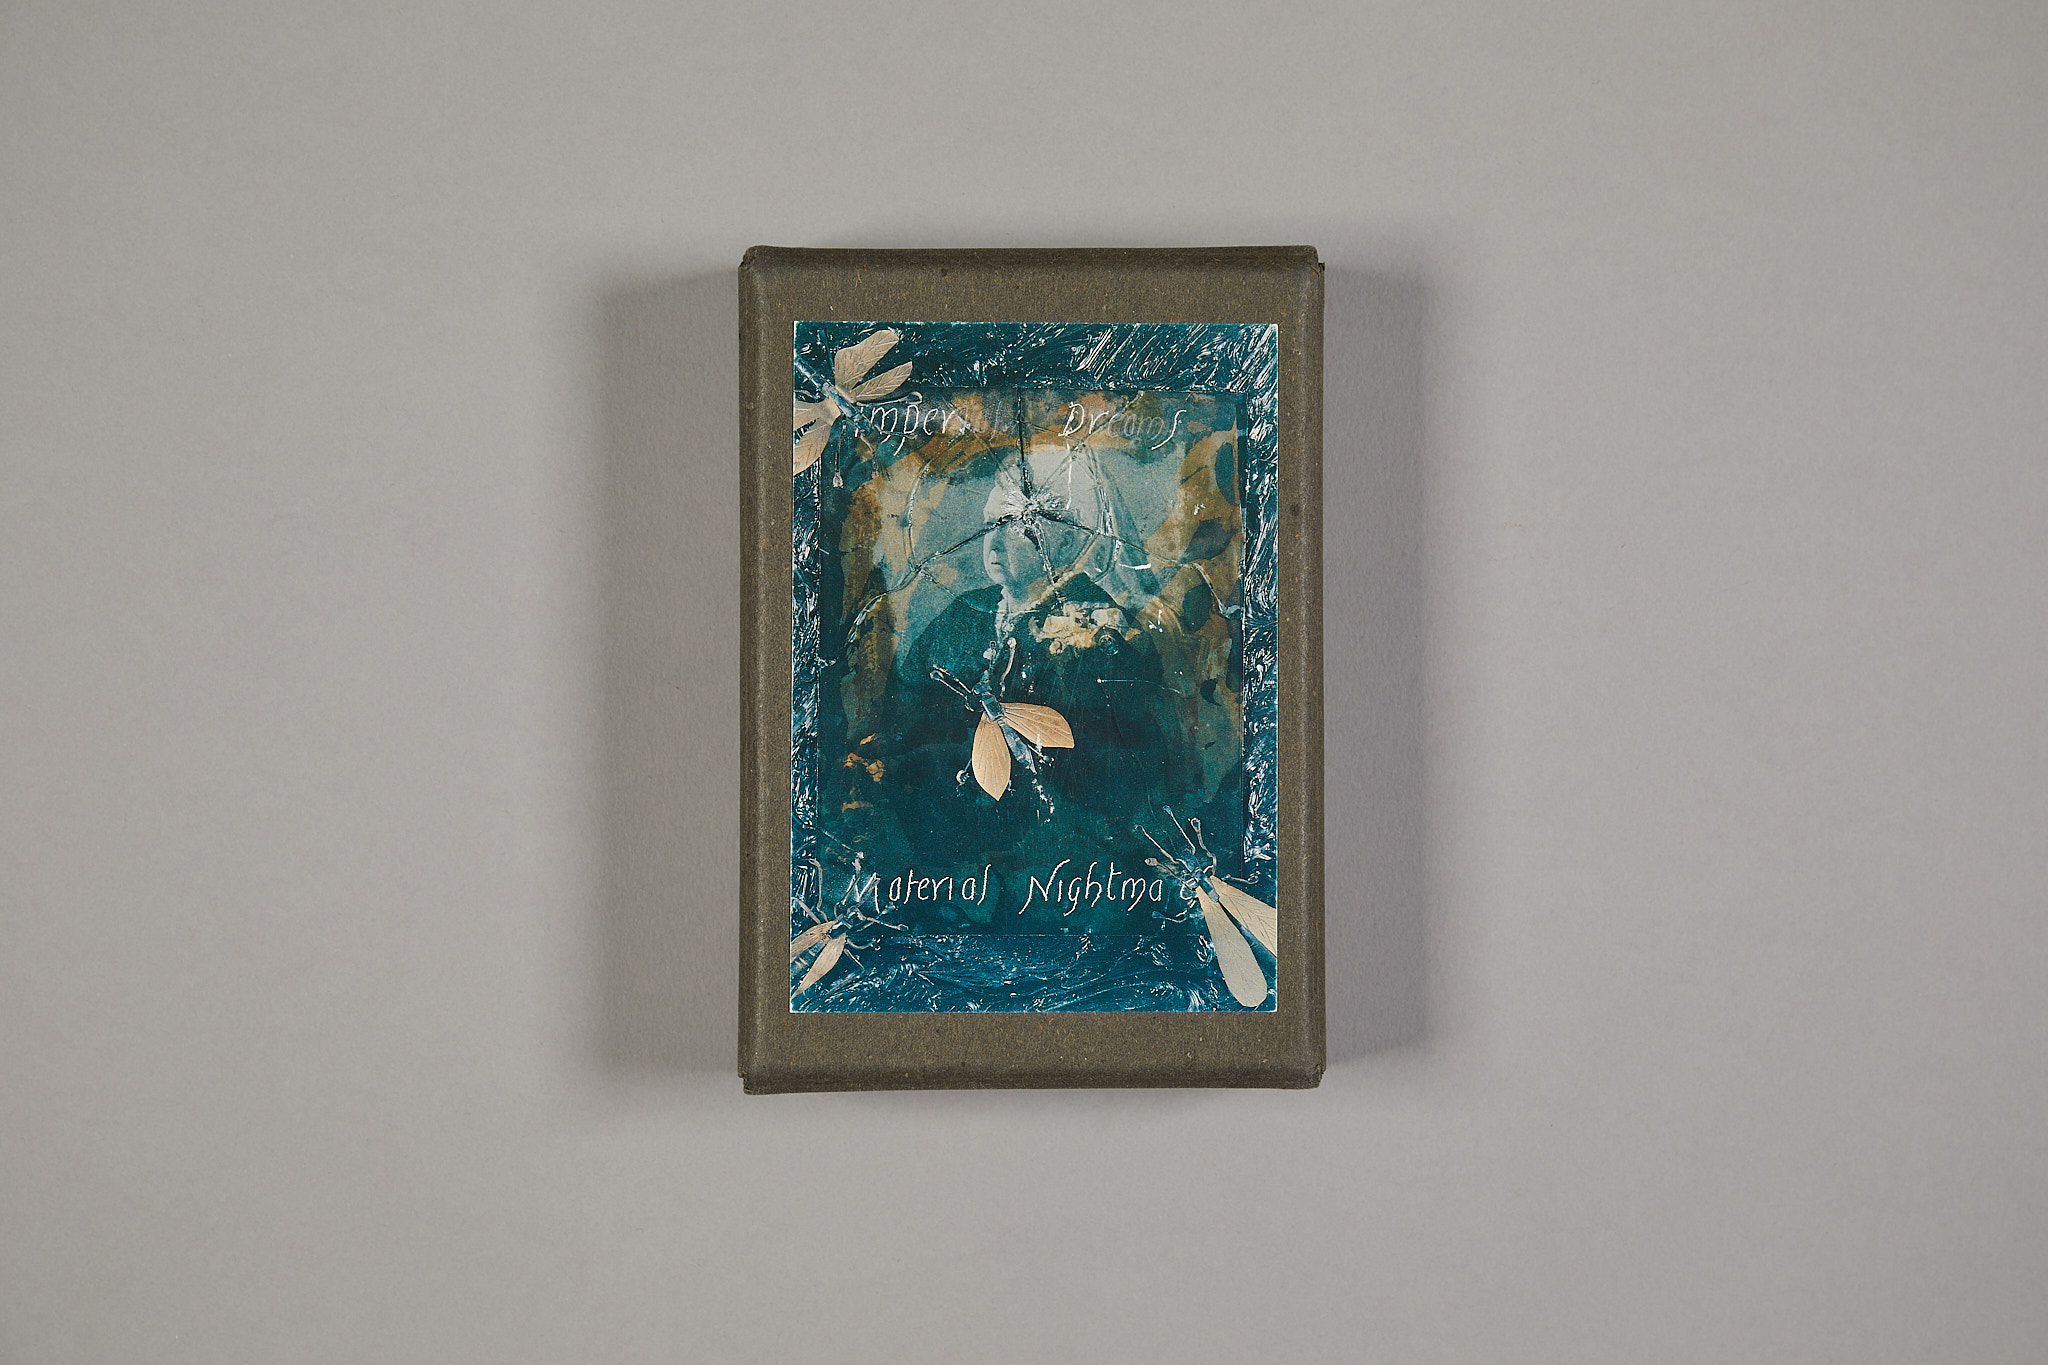 Derek Jarman: reliquary by Barbican Art Gallery (London) (1996)